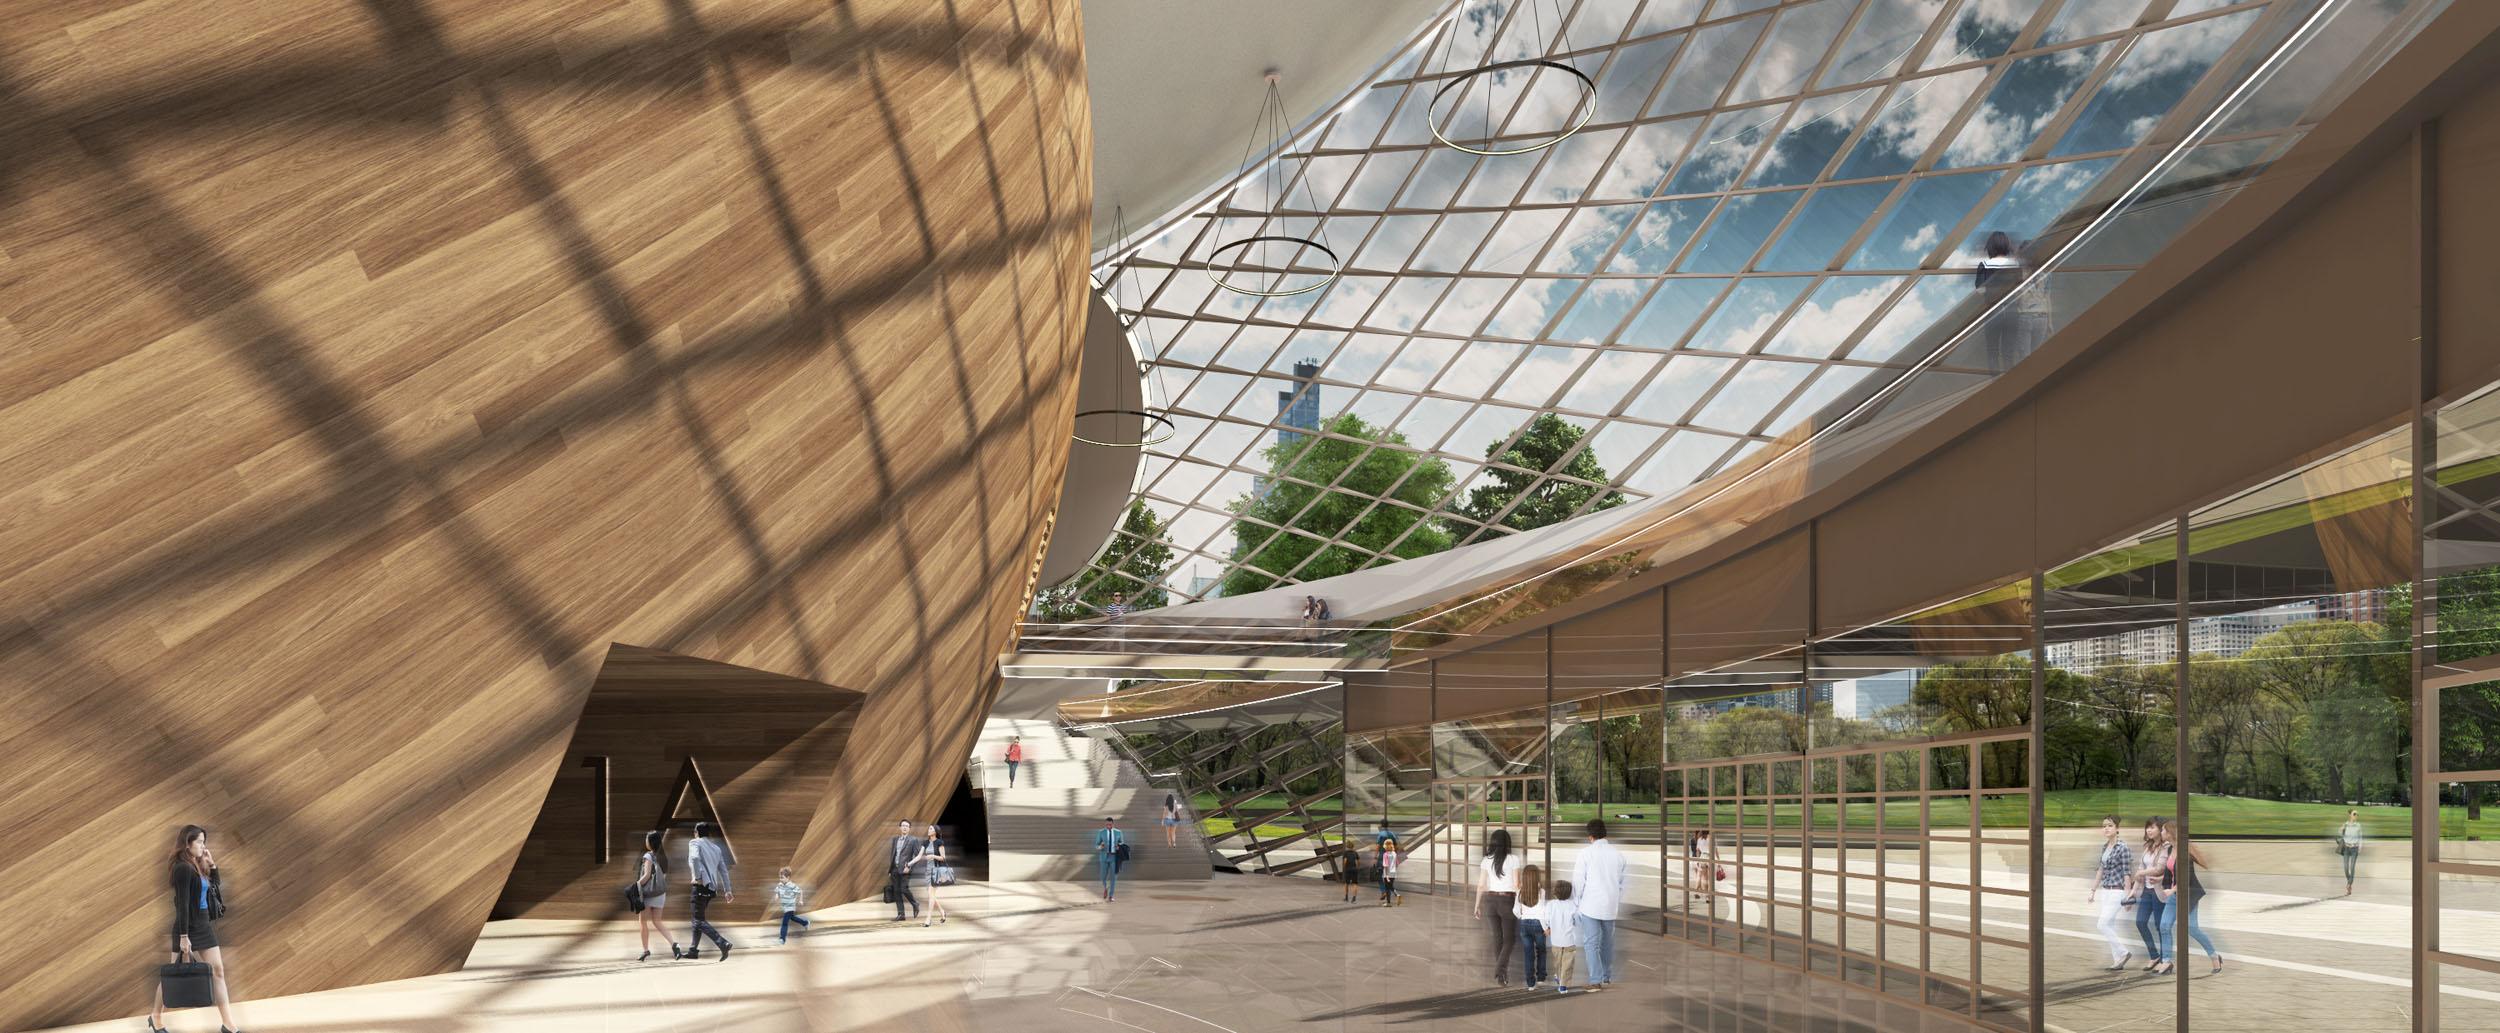 Table Tennis Stadium – Render – Interior Lobby